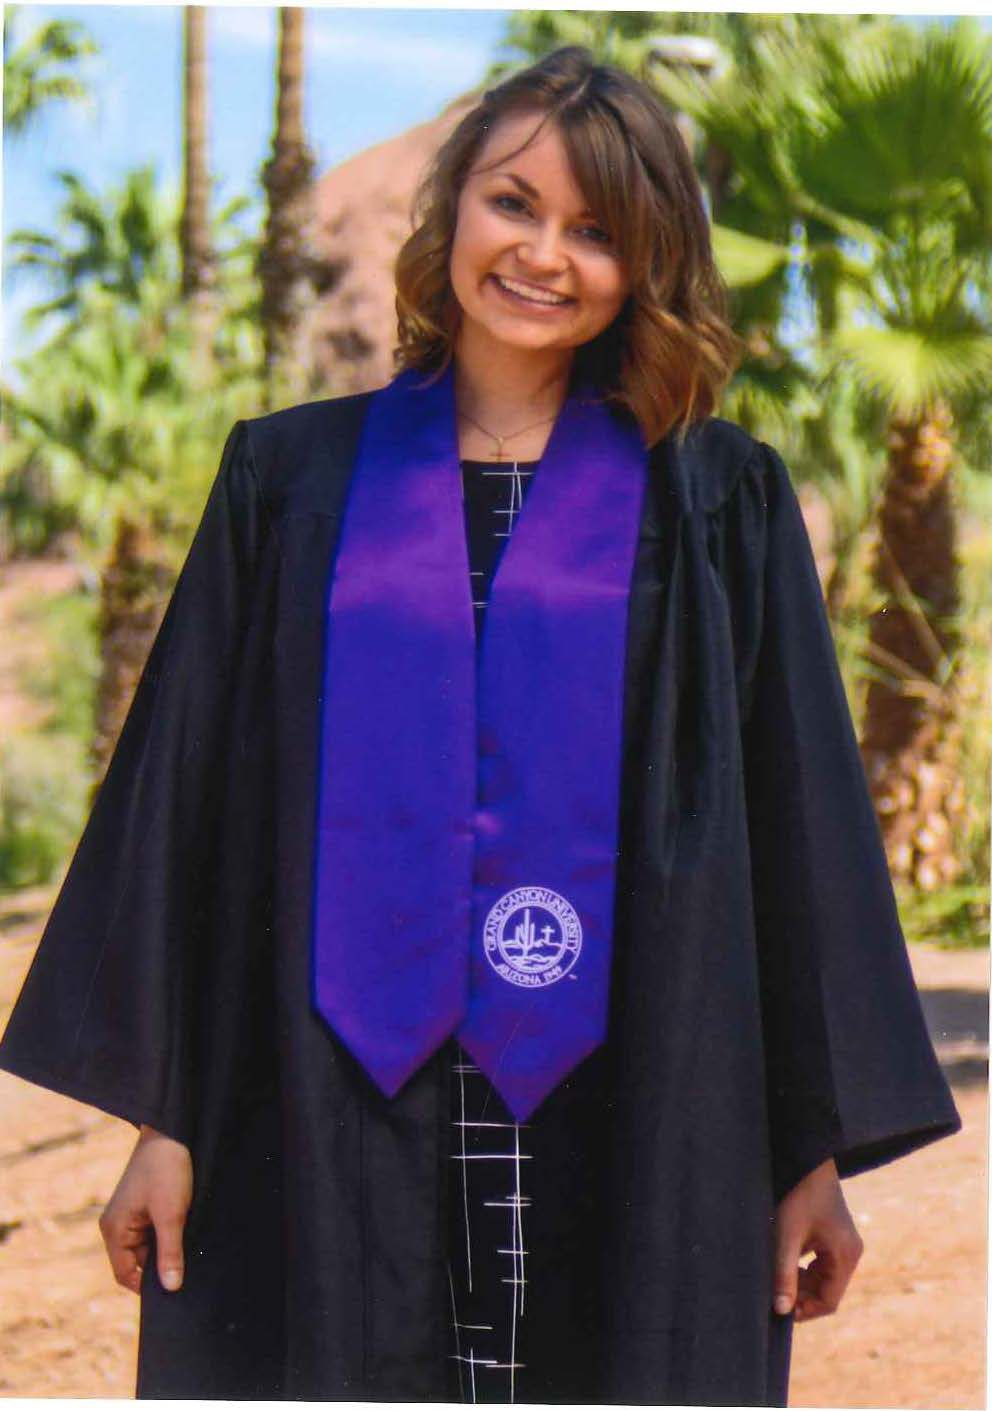 Awc Certified Nursing Assistant Program Returns To La Paz County